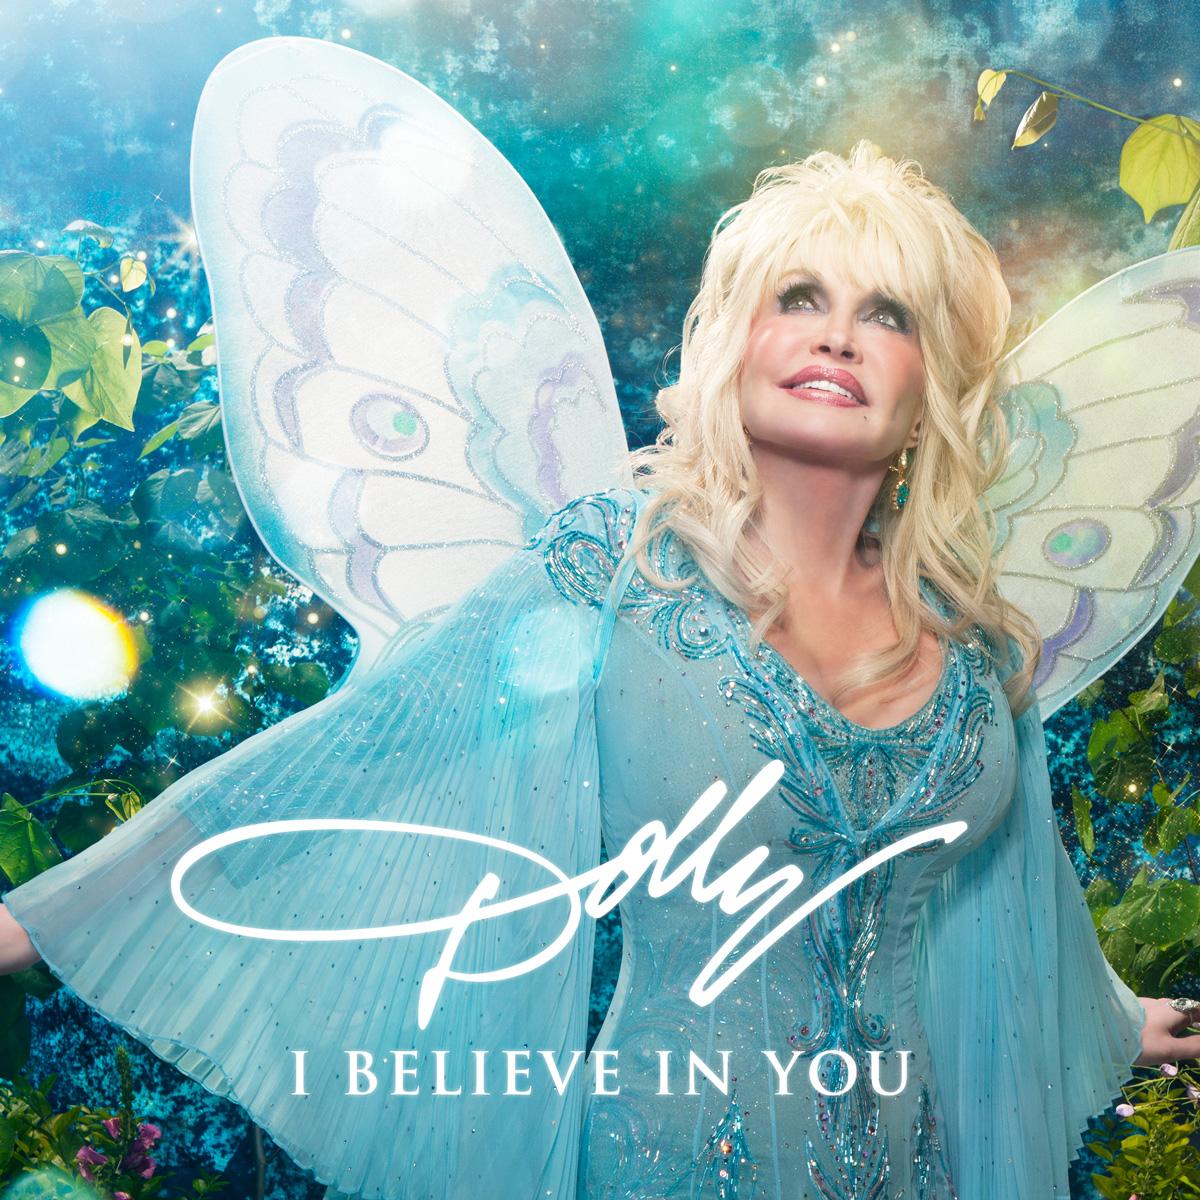 dolly-parton-i-believe